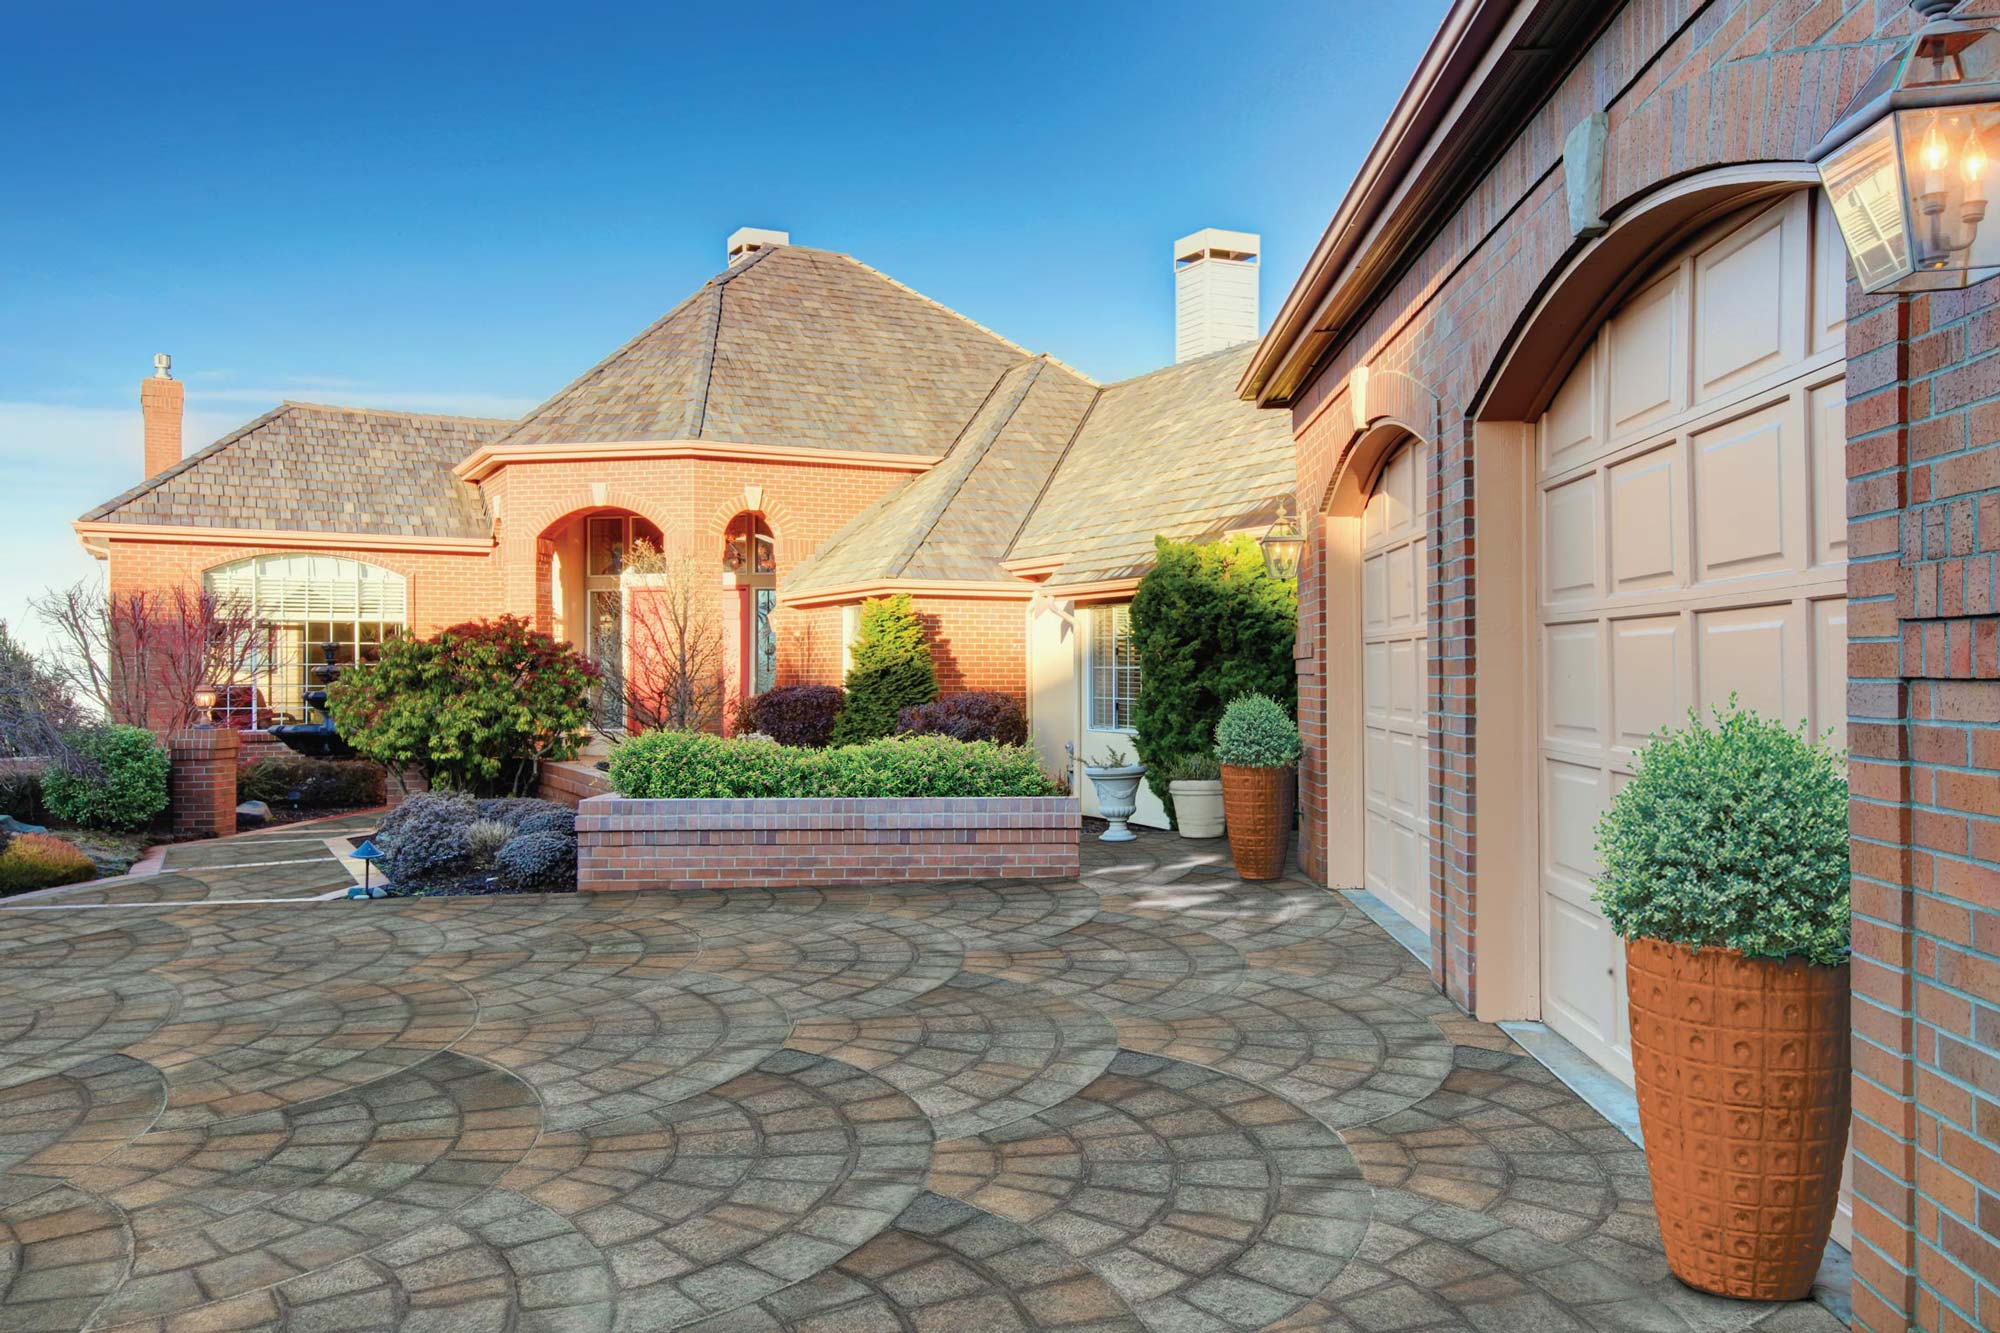 image 2 - cobblestone driveway.jpg